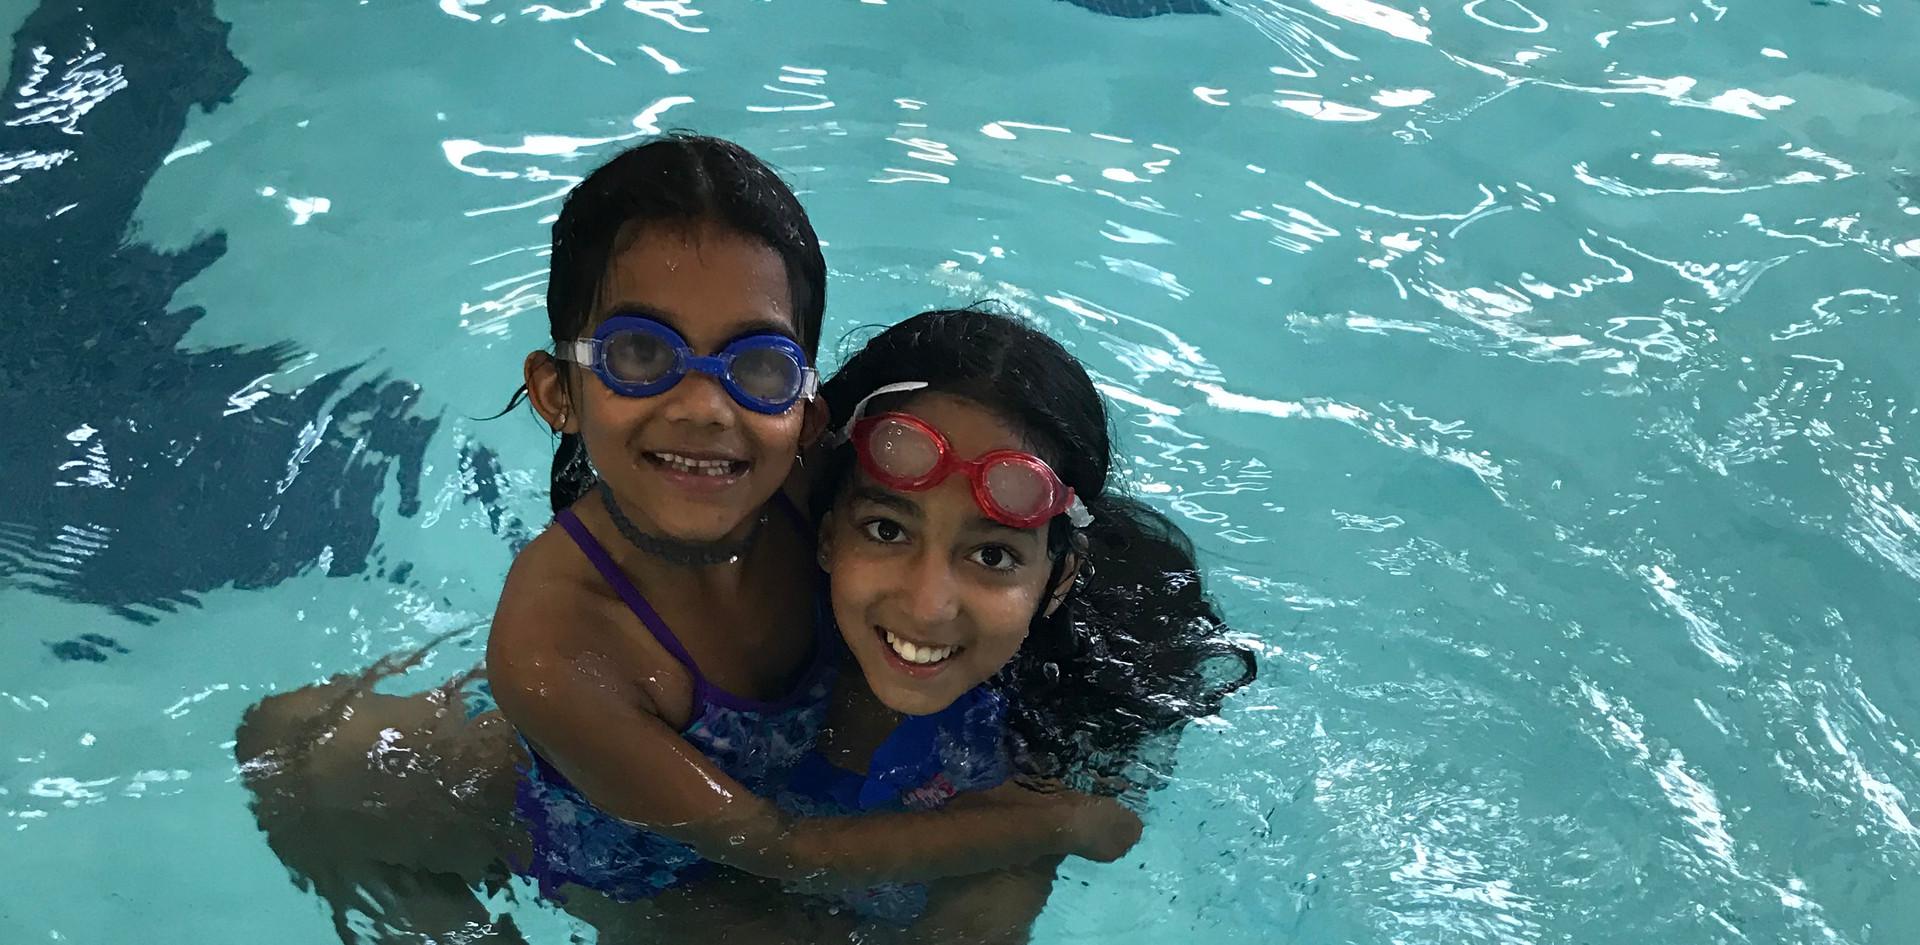 Pool fun with friends